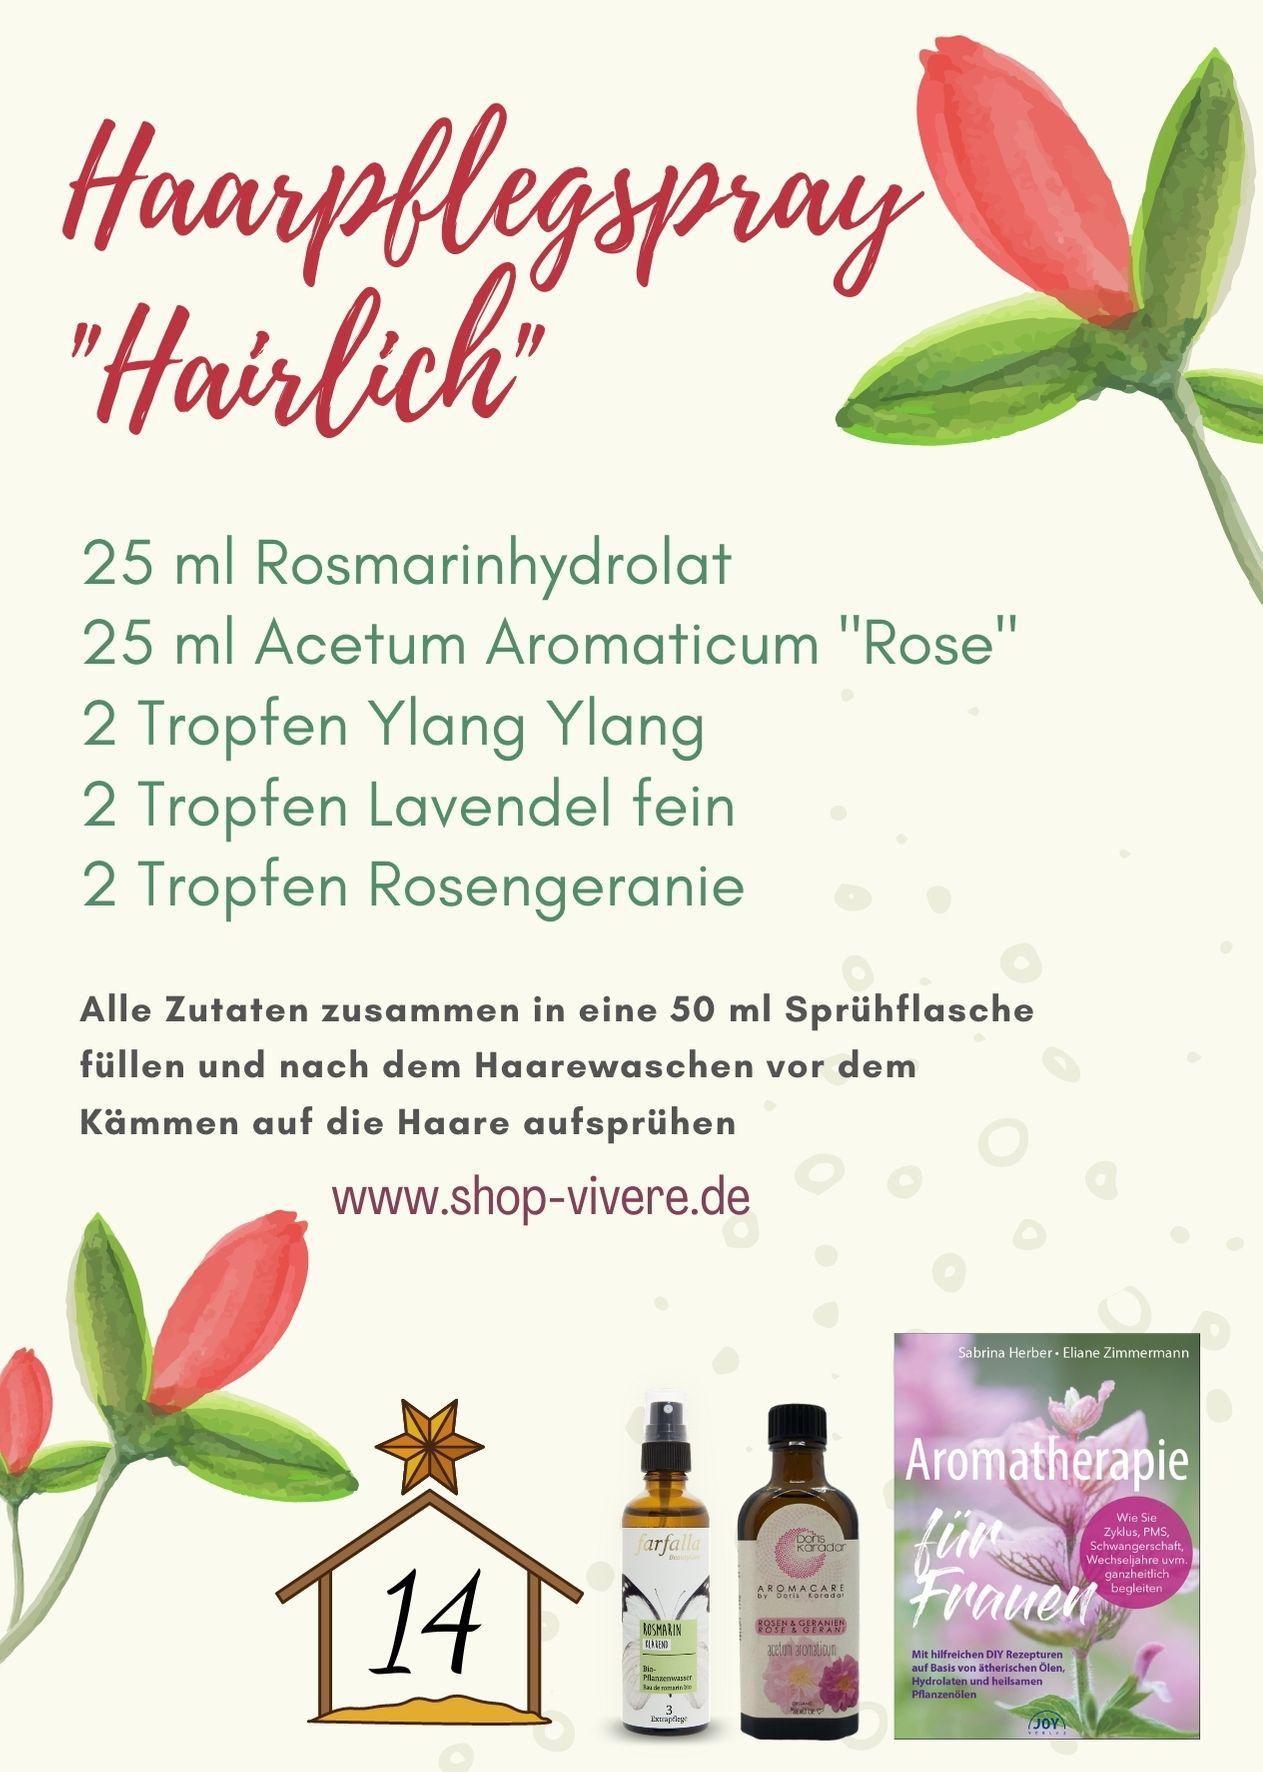 Adventskalender – Aromatherapie 14. Dezember